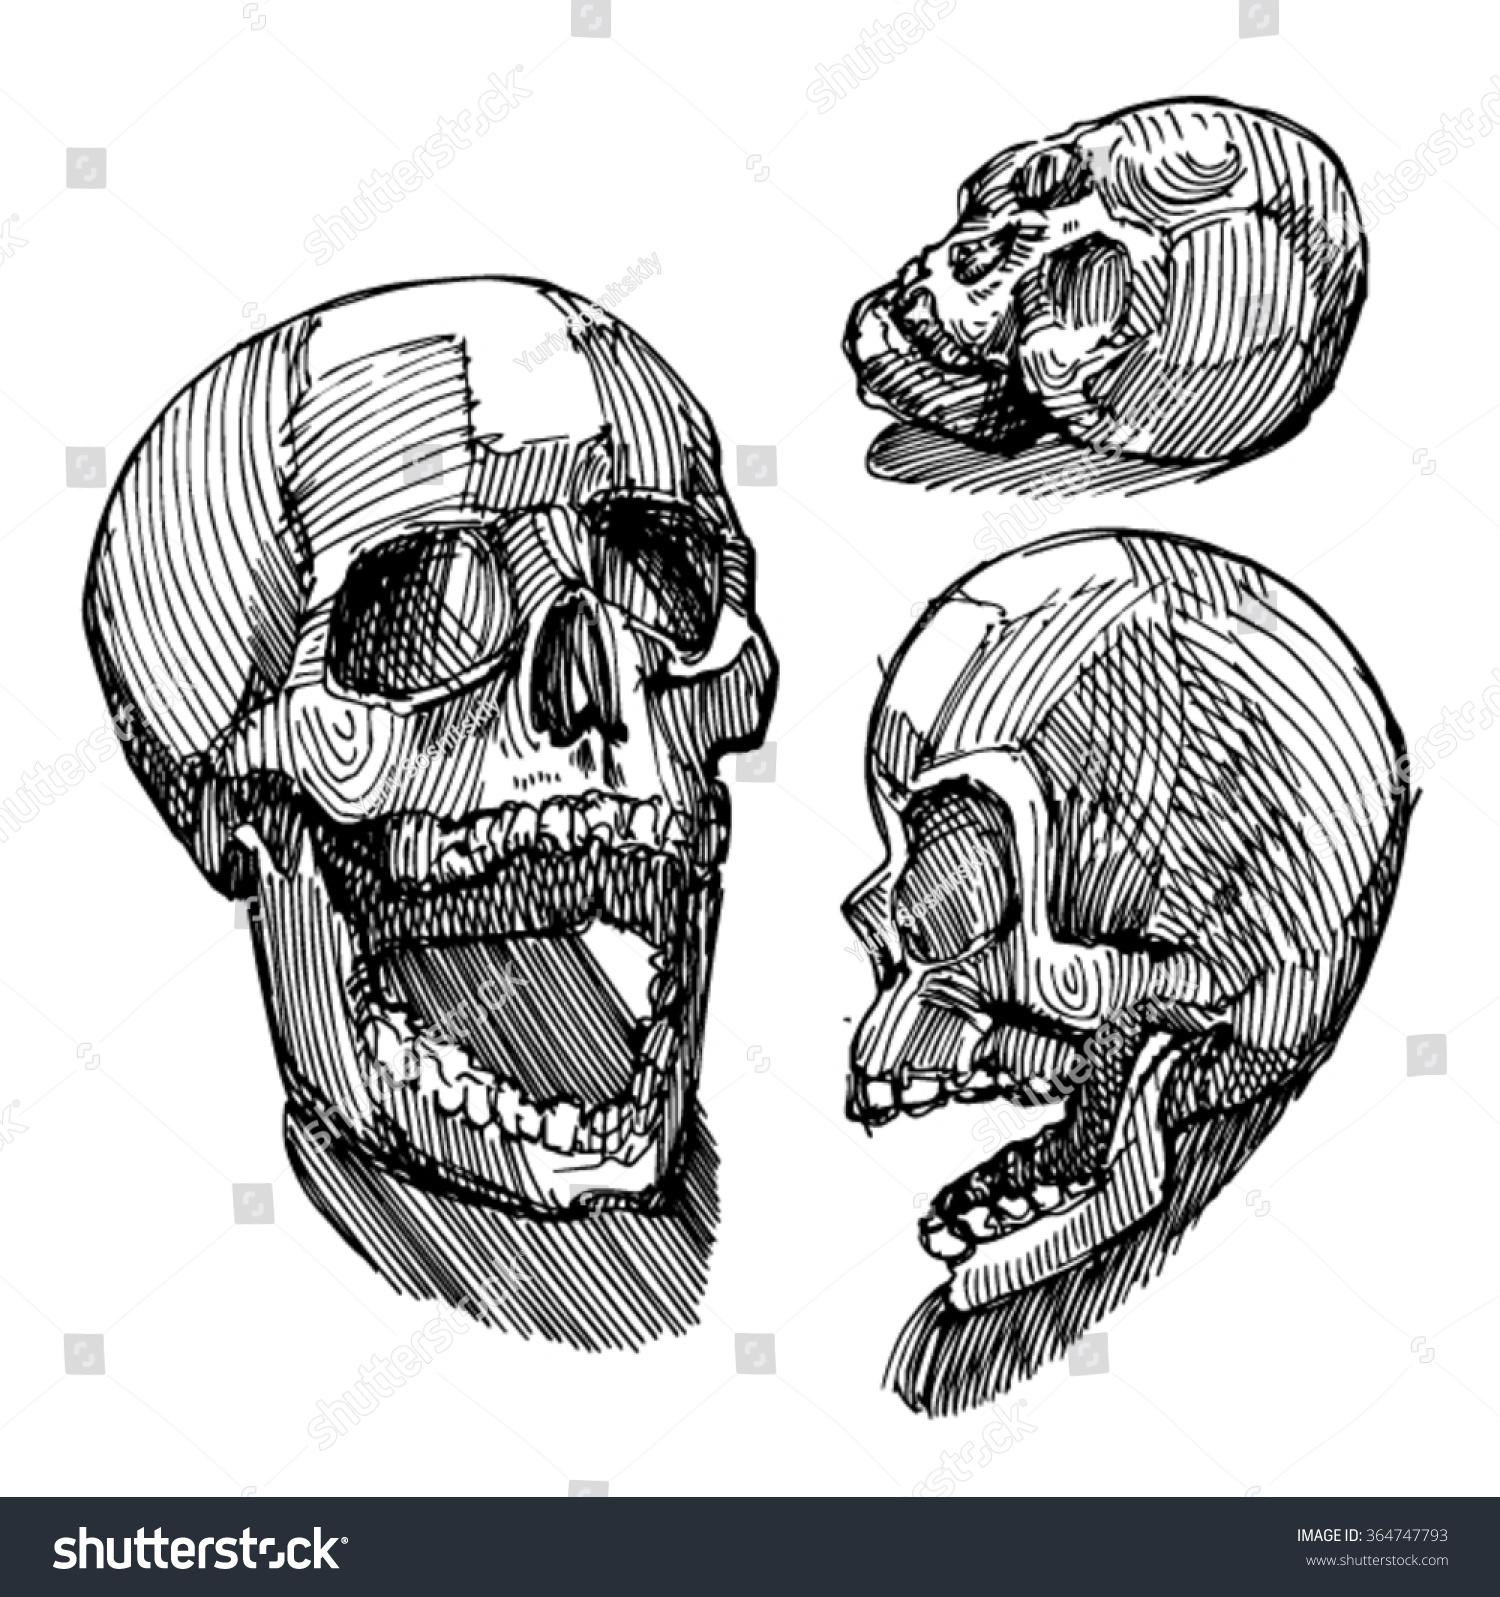 Sketch Skull Sketch Anatomical Skull Academic Stock Vector 364747793 ...